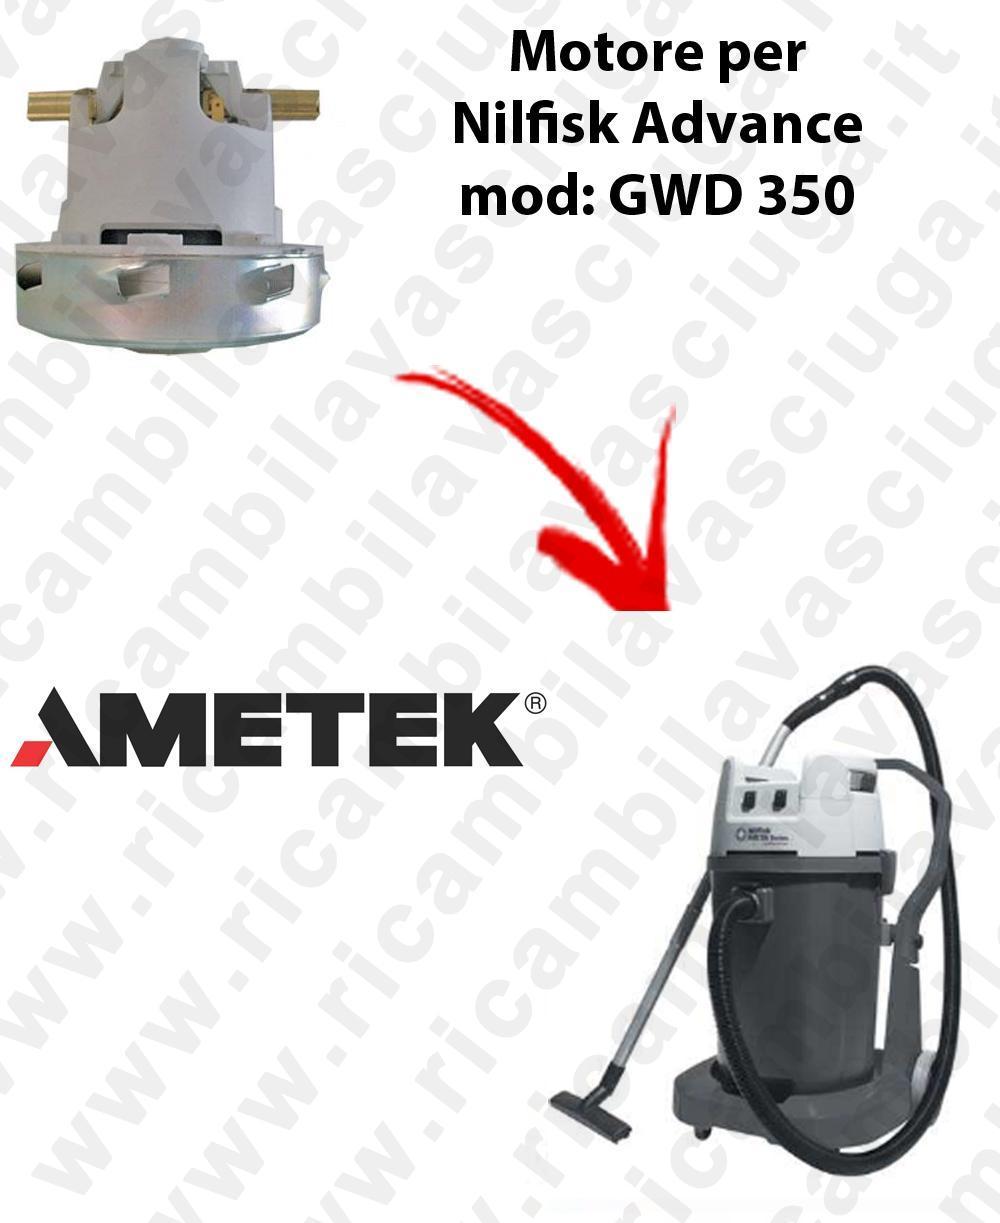 GWD 350  Motore de aspiración AMETEK para aspiradora Nilfisk Advance